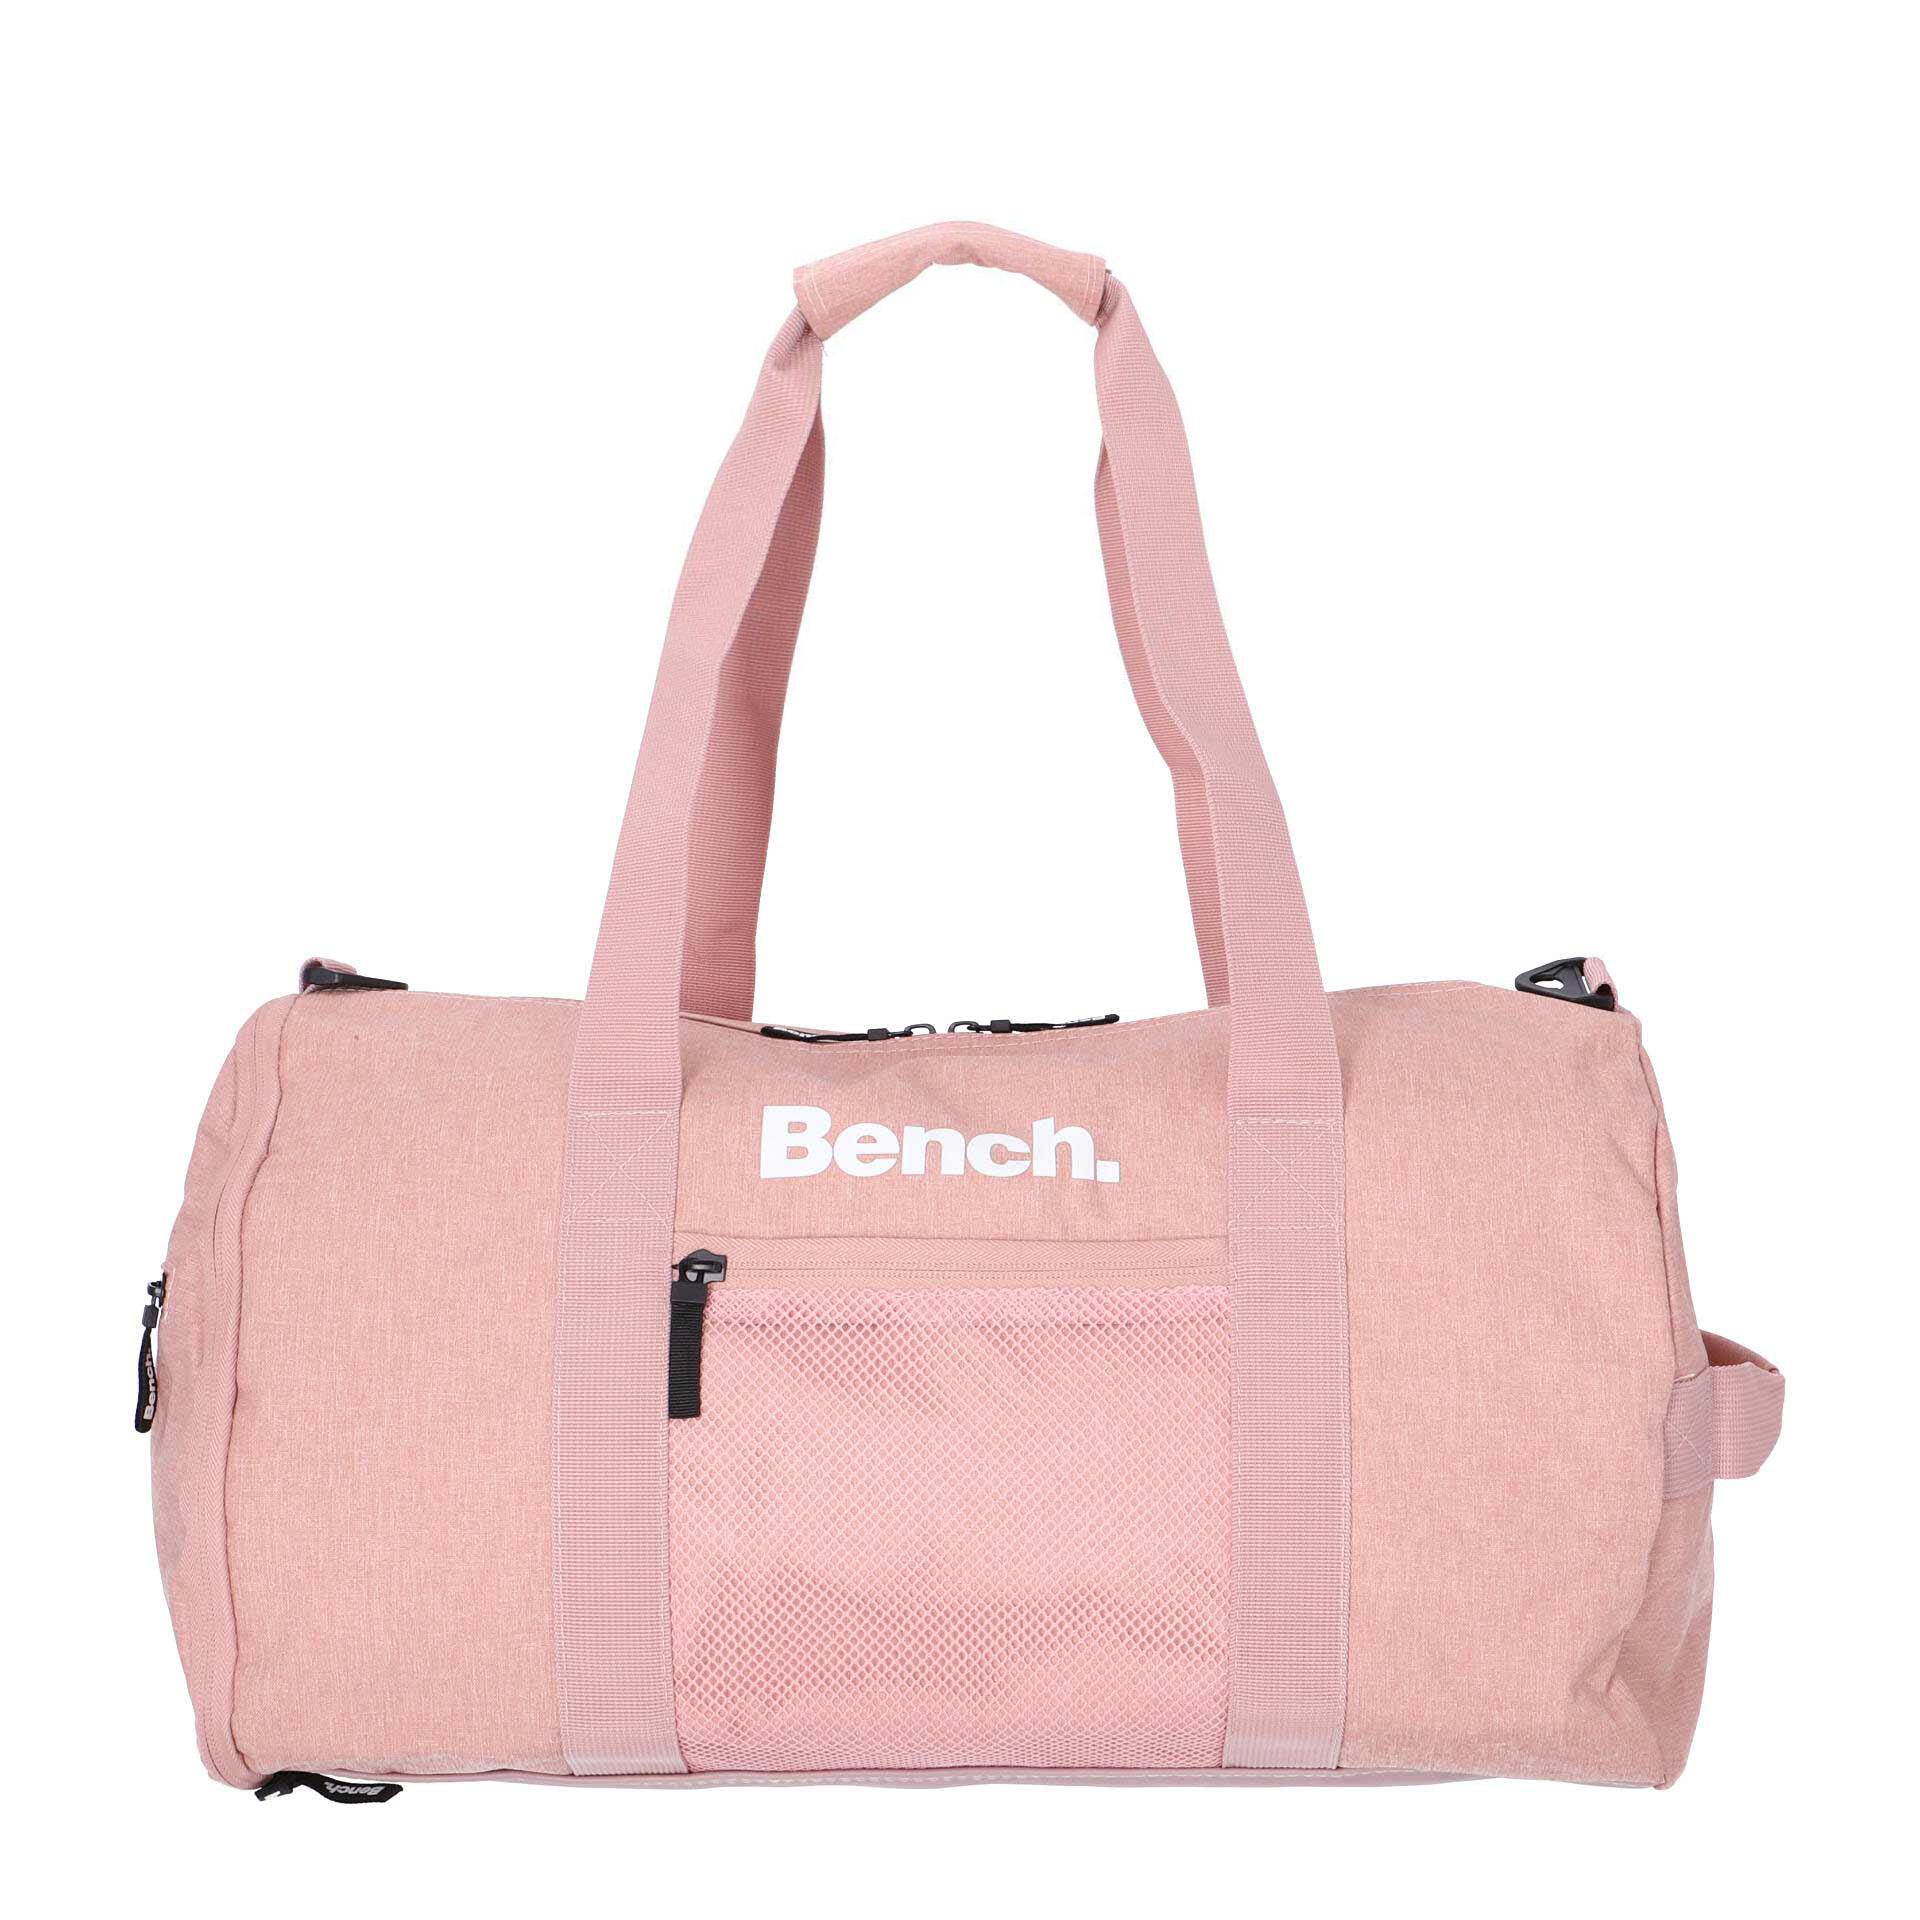 Bench  Sporttasche altrosa